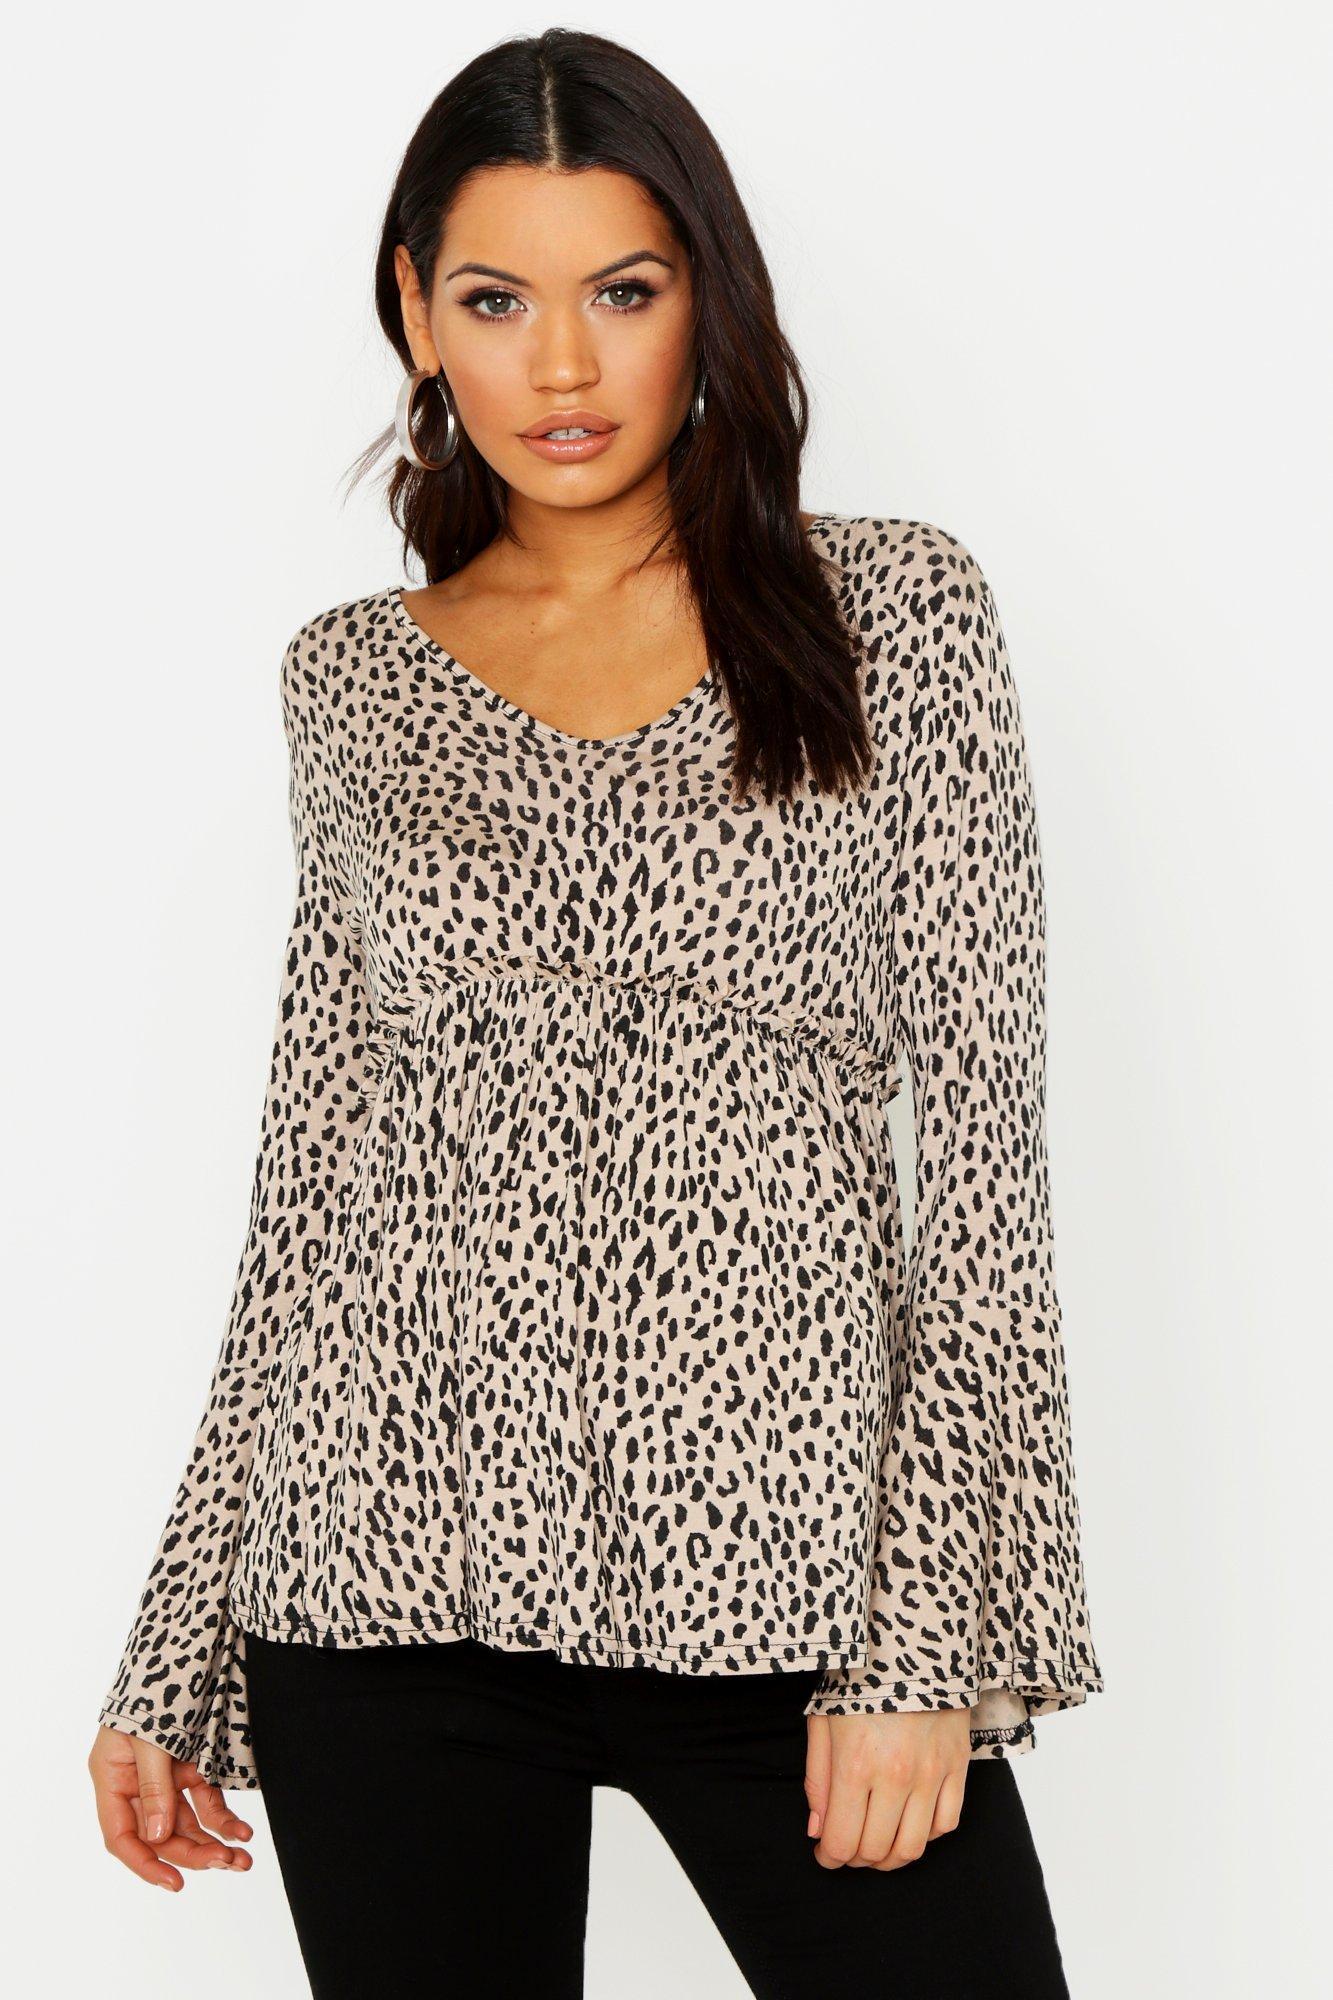 05caa839ab504 Boohoo. Women's Maternity Leopard Smock Wrap Top